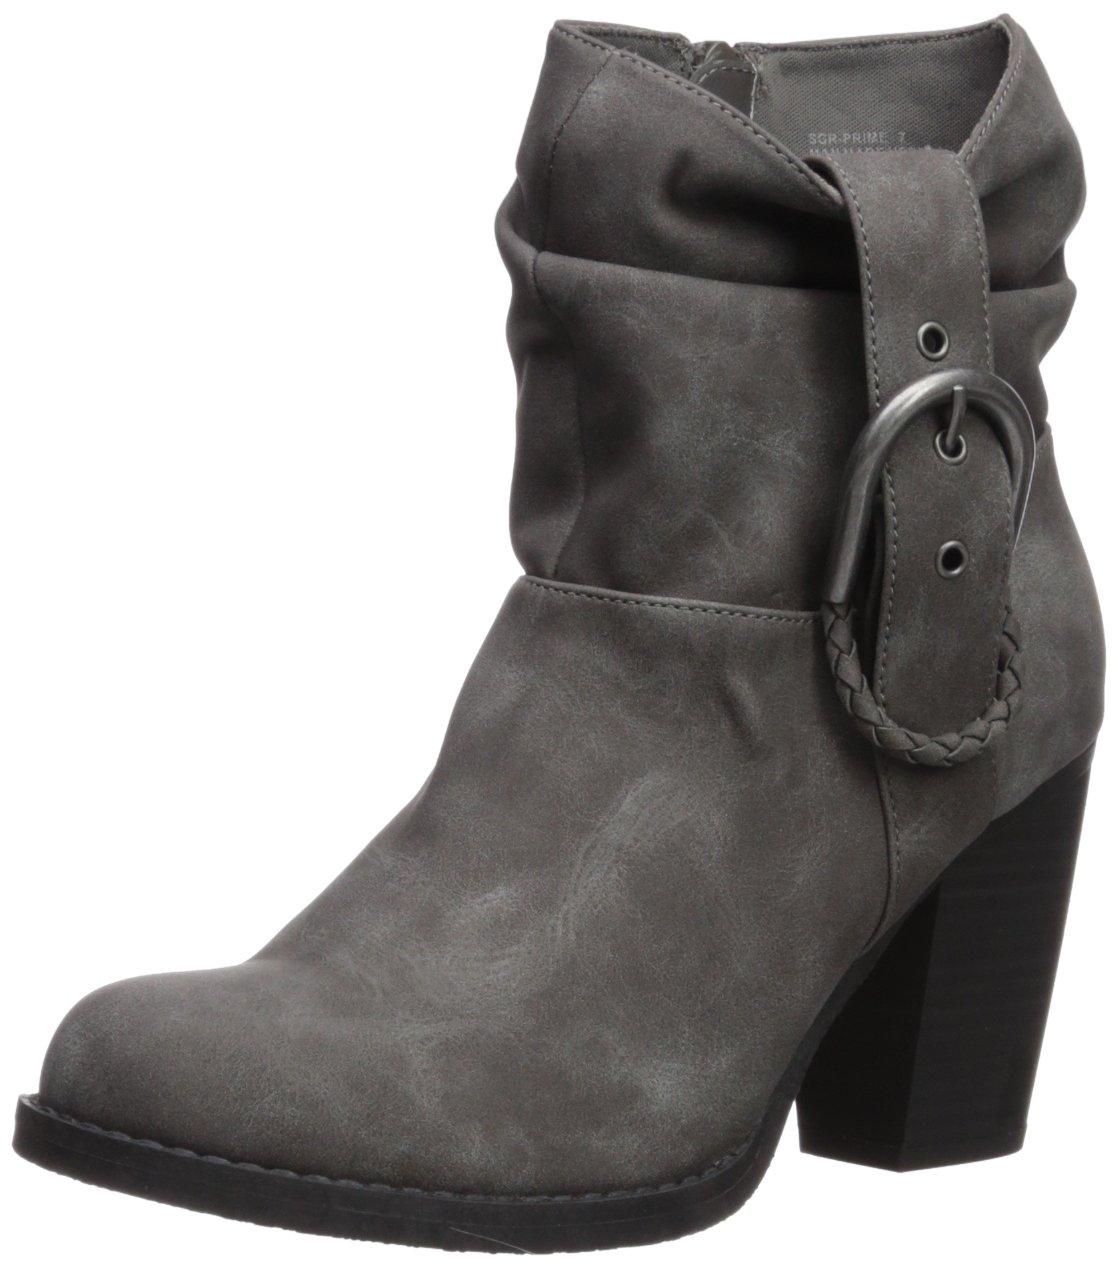 Sugar Women's SGR-Prime Ankle Boot, Charcoal Nubuck, 8 Medium US